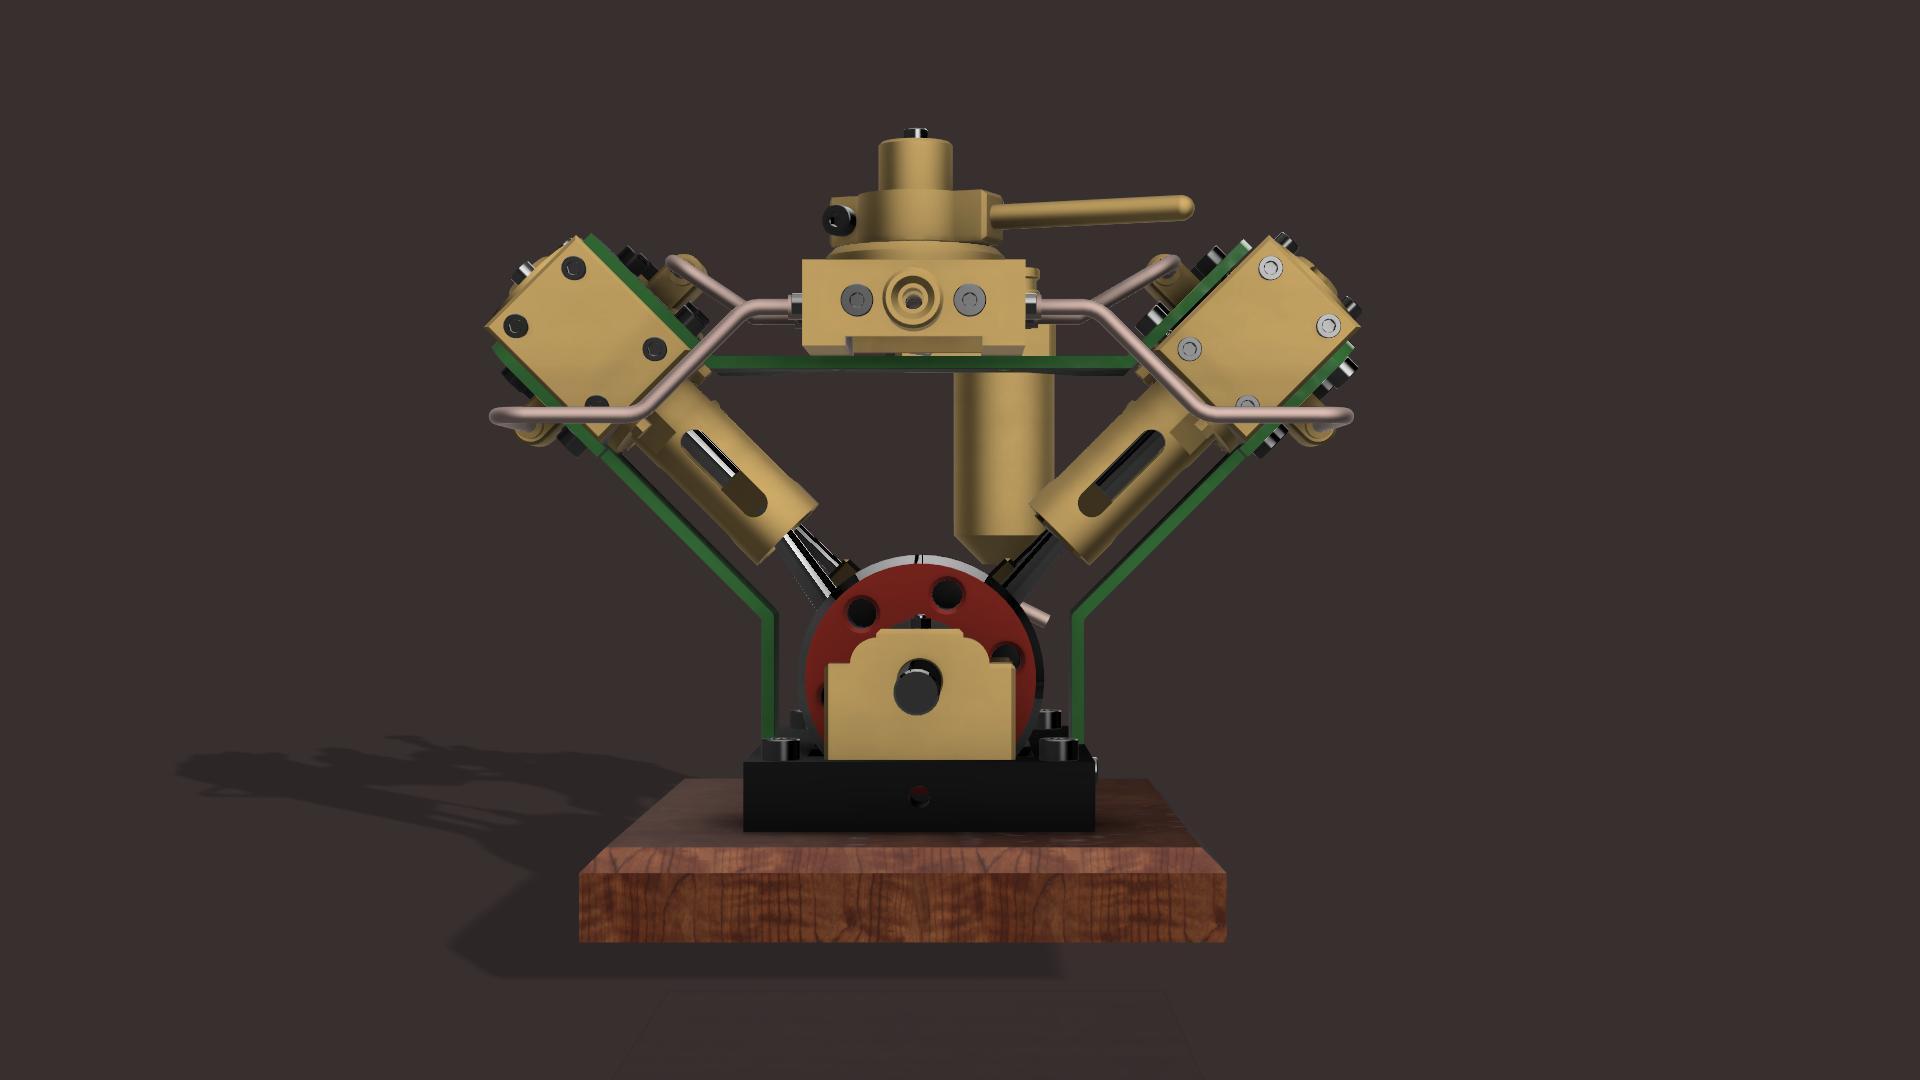 twin piston engine autodesk online gallery. Black Bedroom Furniture Sets. Home Design Ideas